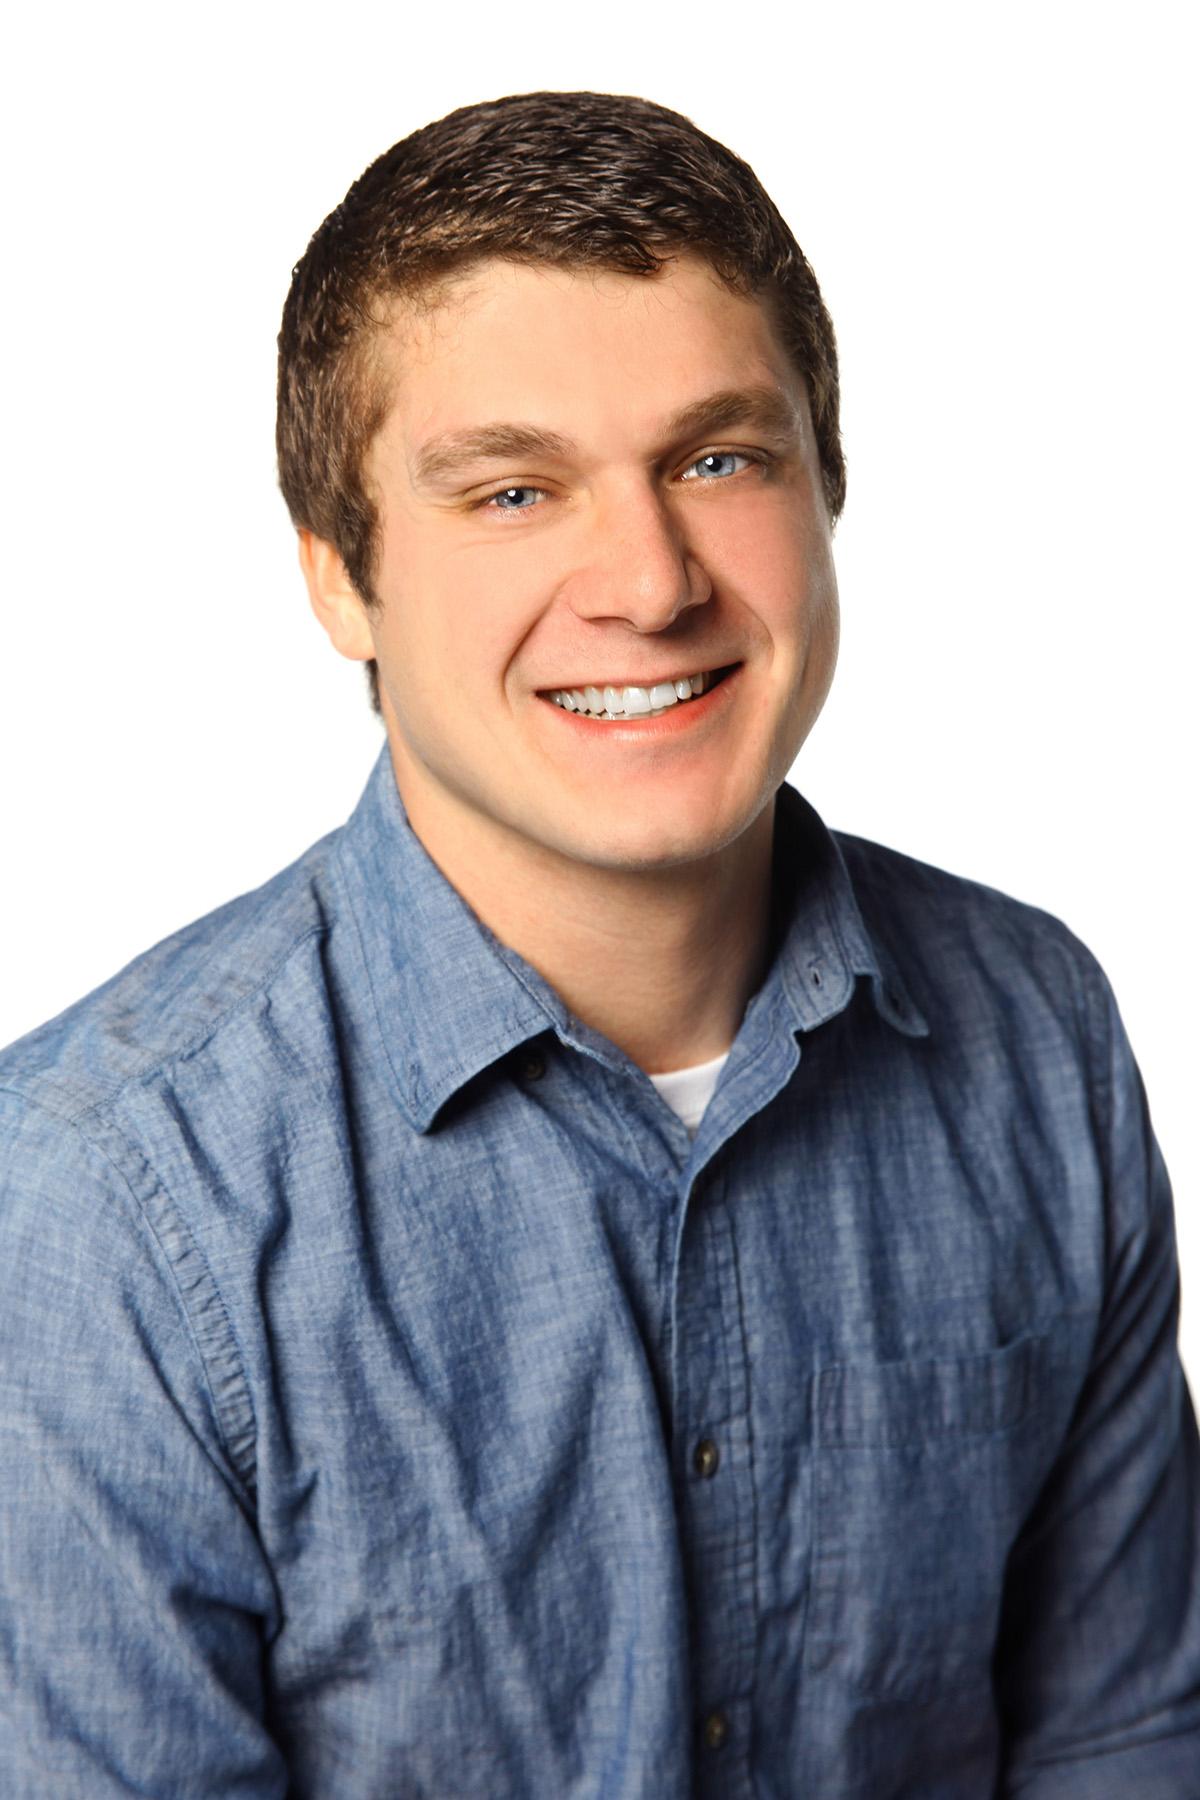 Paul Pitner